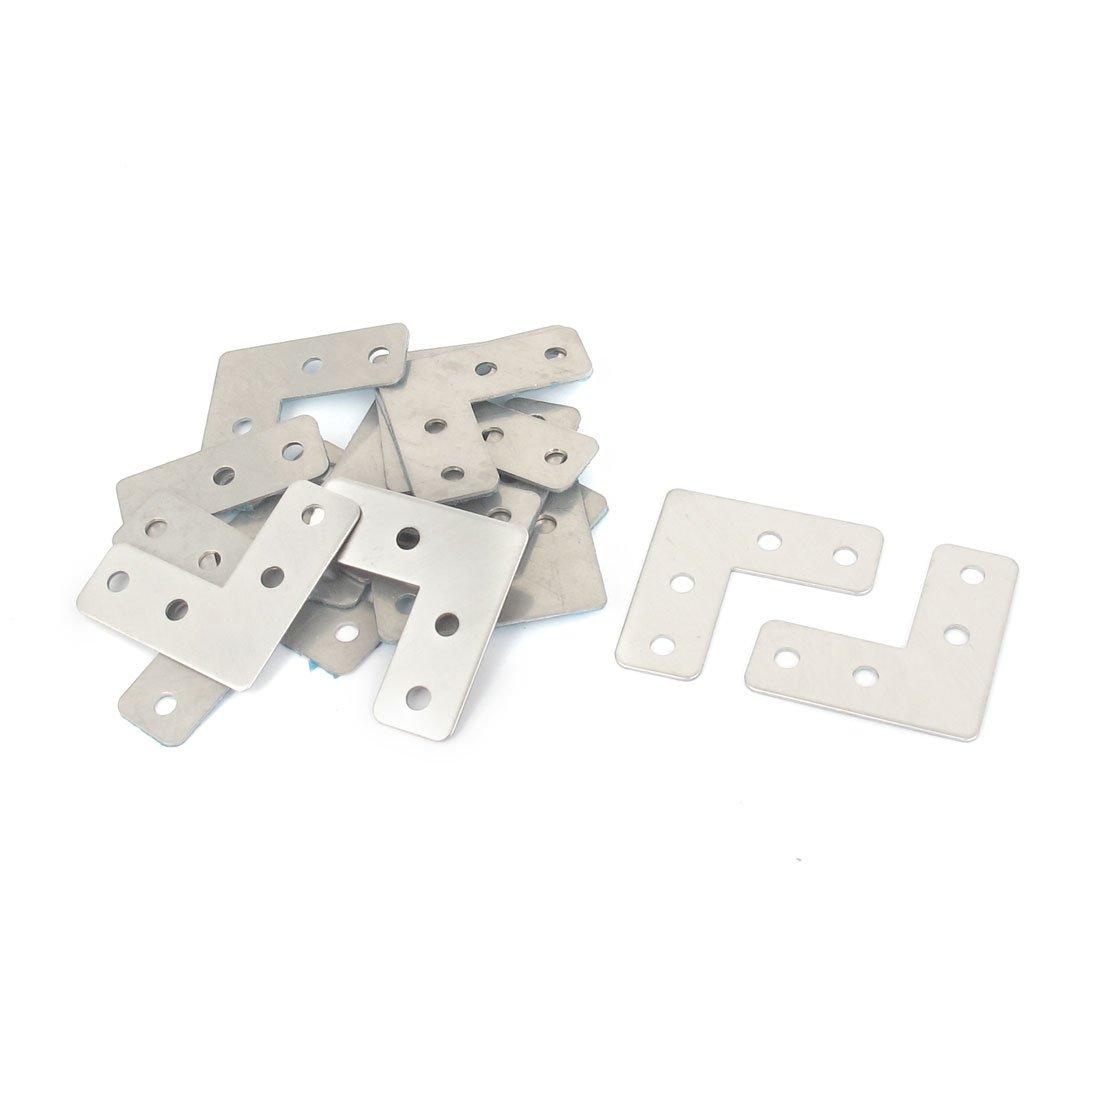 uxcell Angle Plate Corner Brace Flat L Shape Repair Bracket 40 x 40mm 50 Pcs